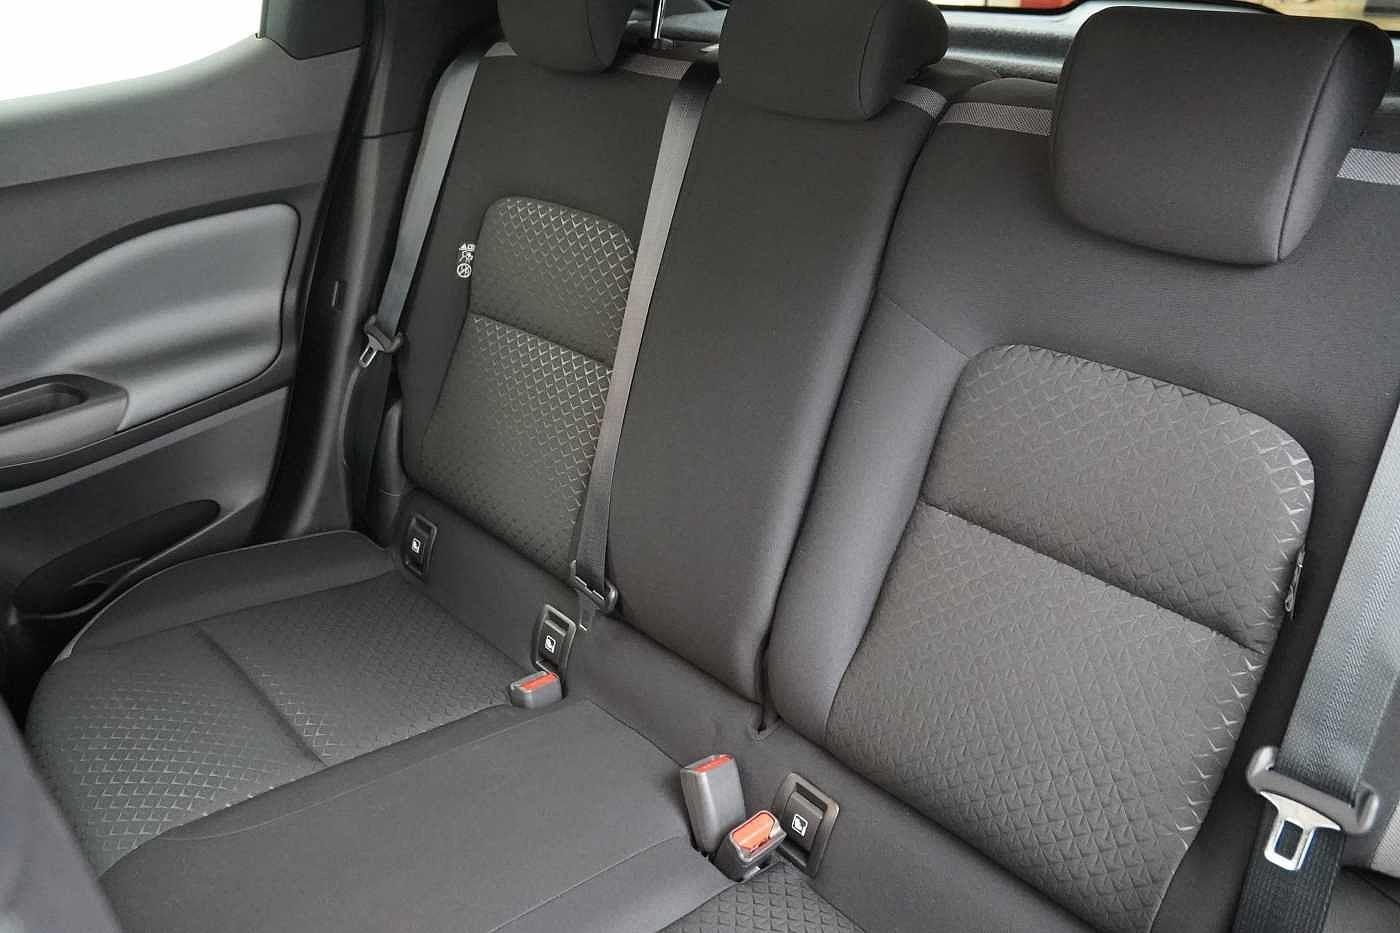 Nissan Juke for sale